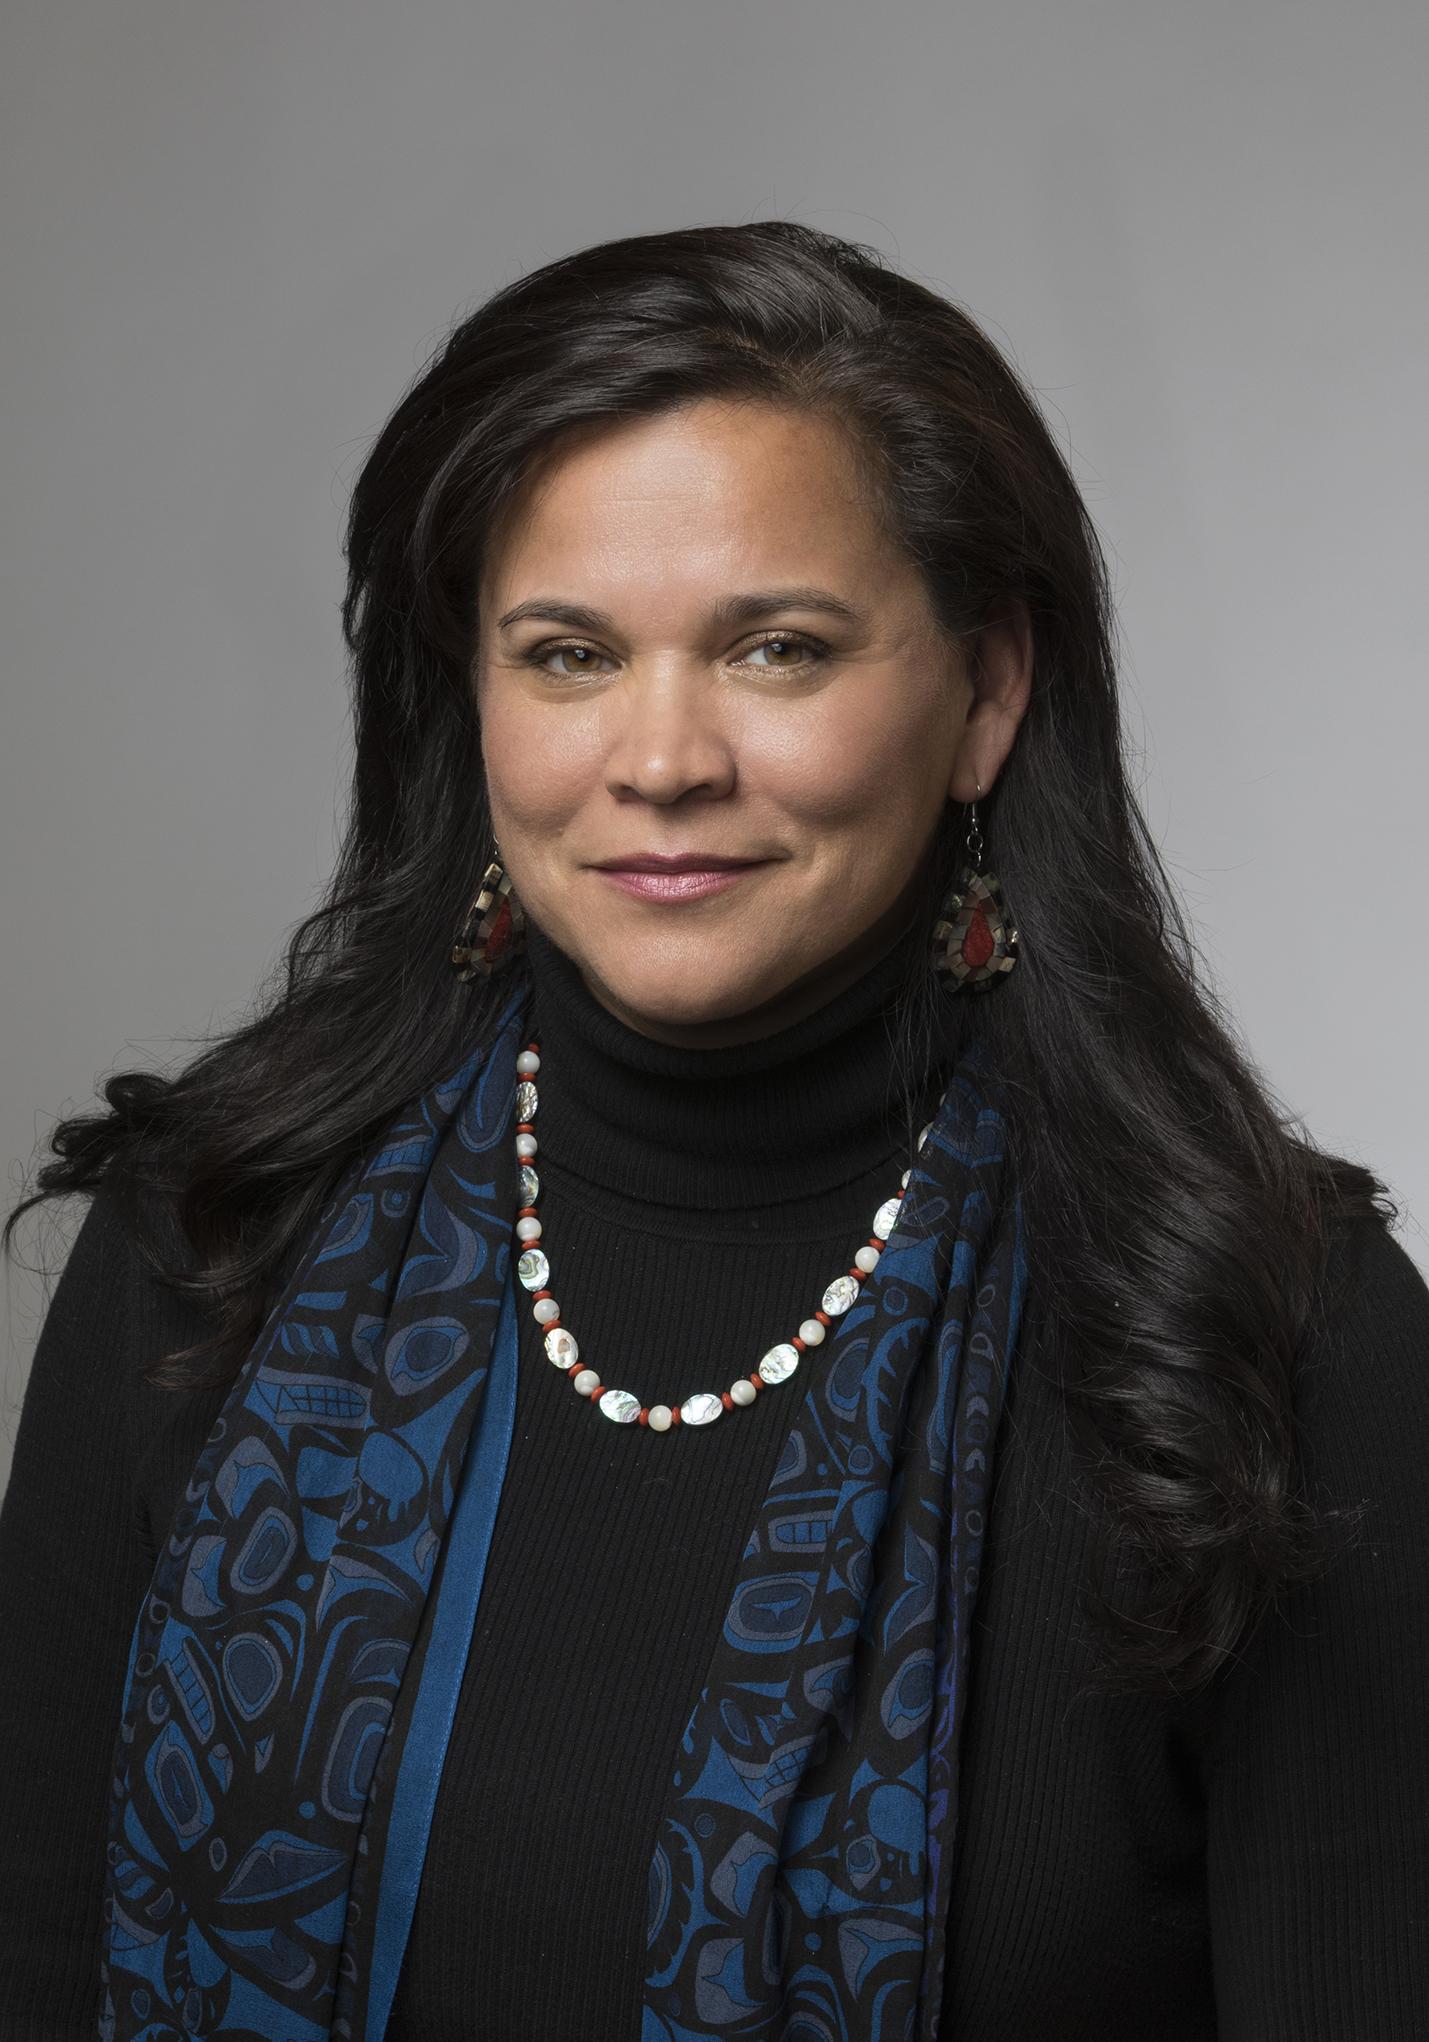 Janeen S. Comenote - Executive Director